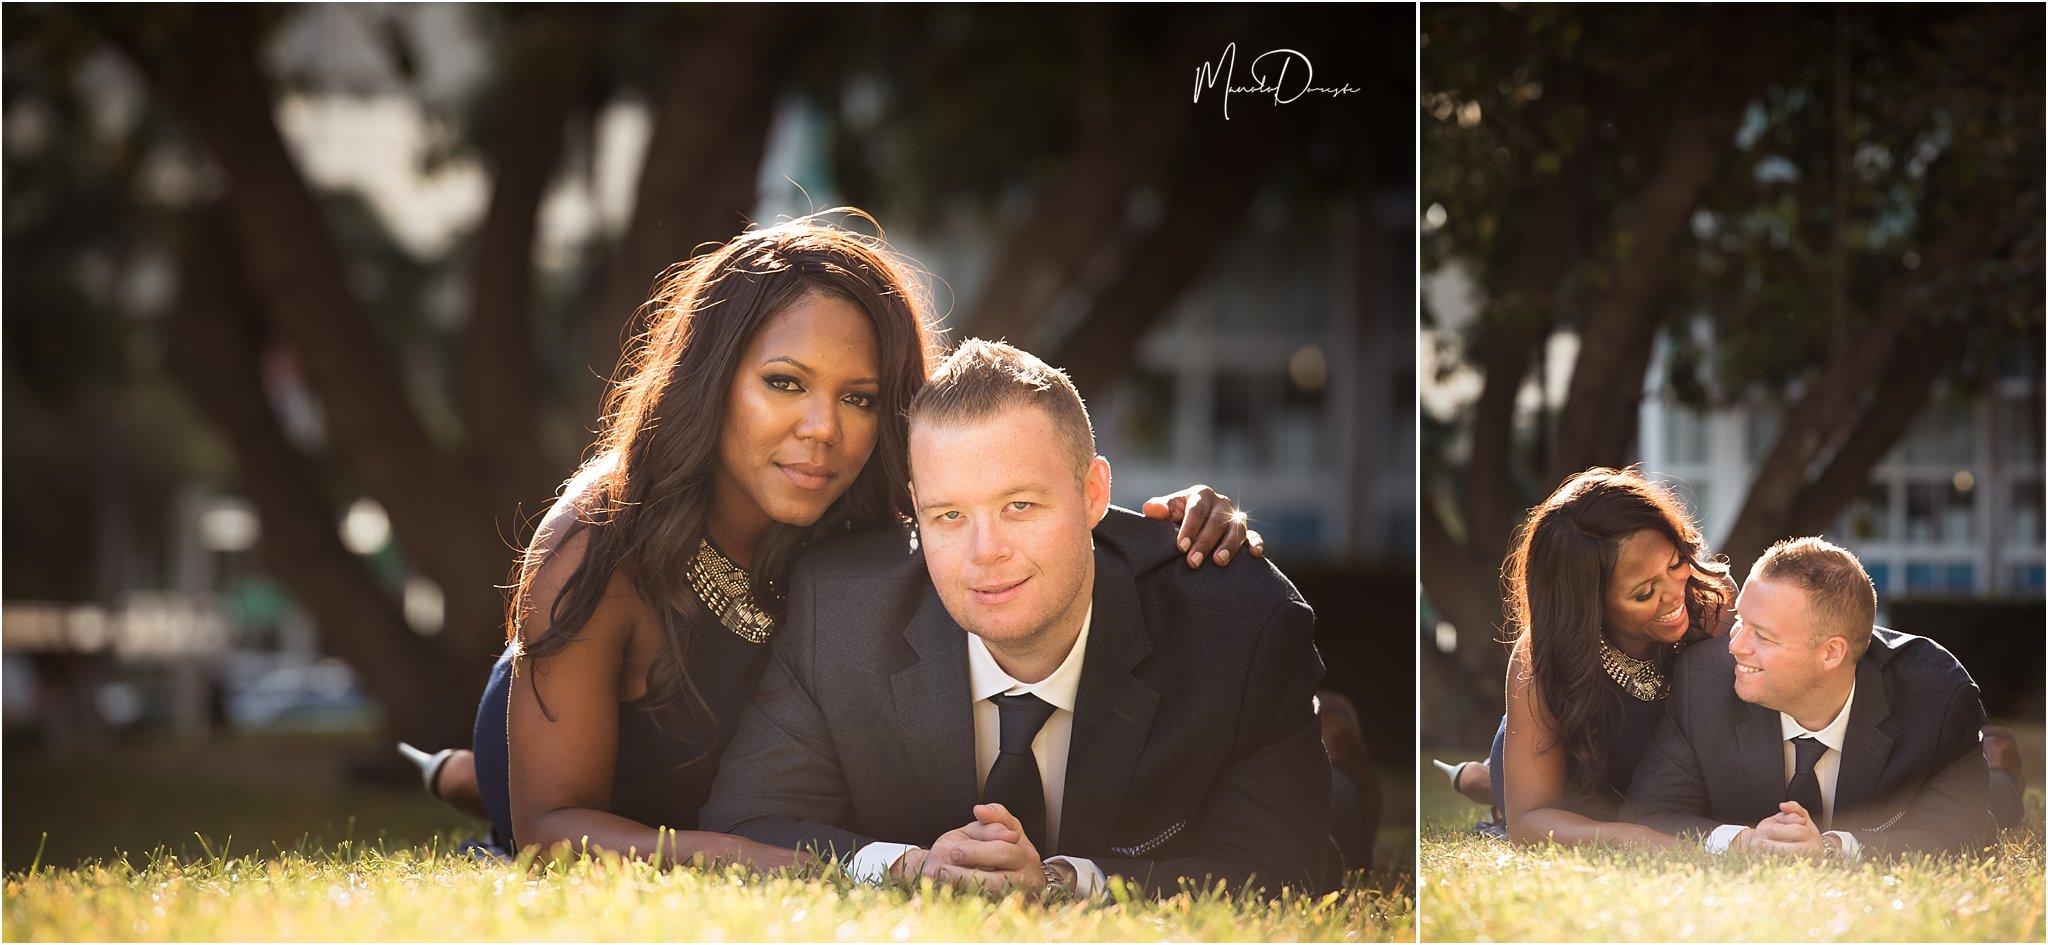 0703_ManoloDoreste_InFocusStudios_Wedding_Family_Photography_Miami_MiamiPhotographer.jpg